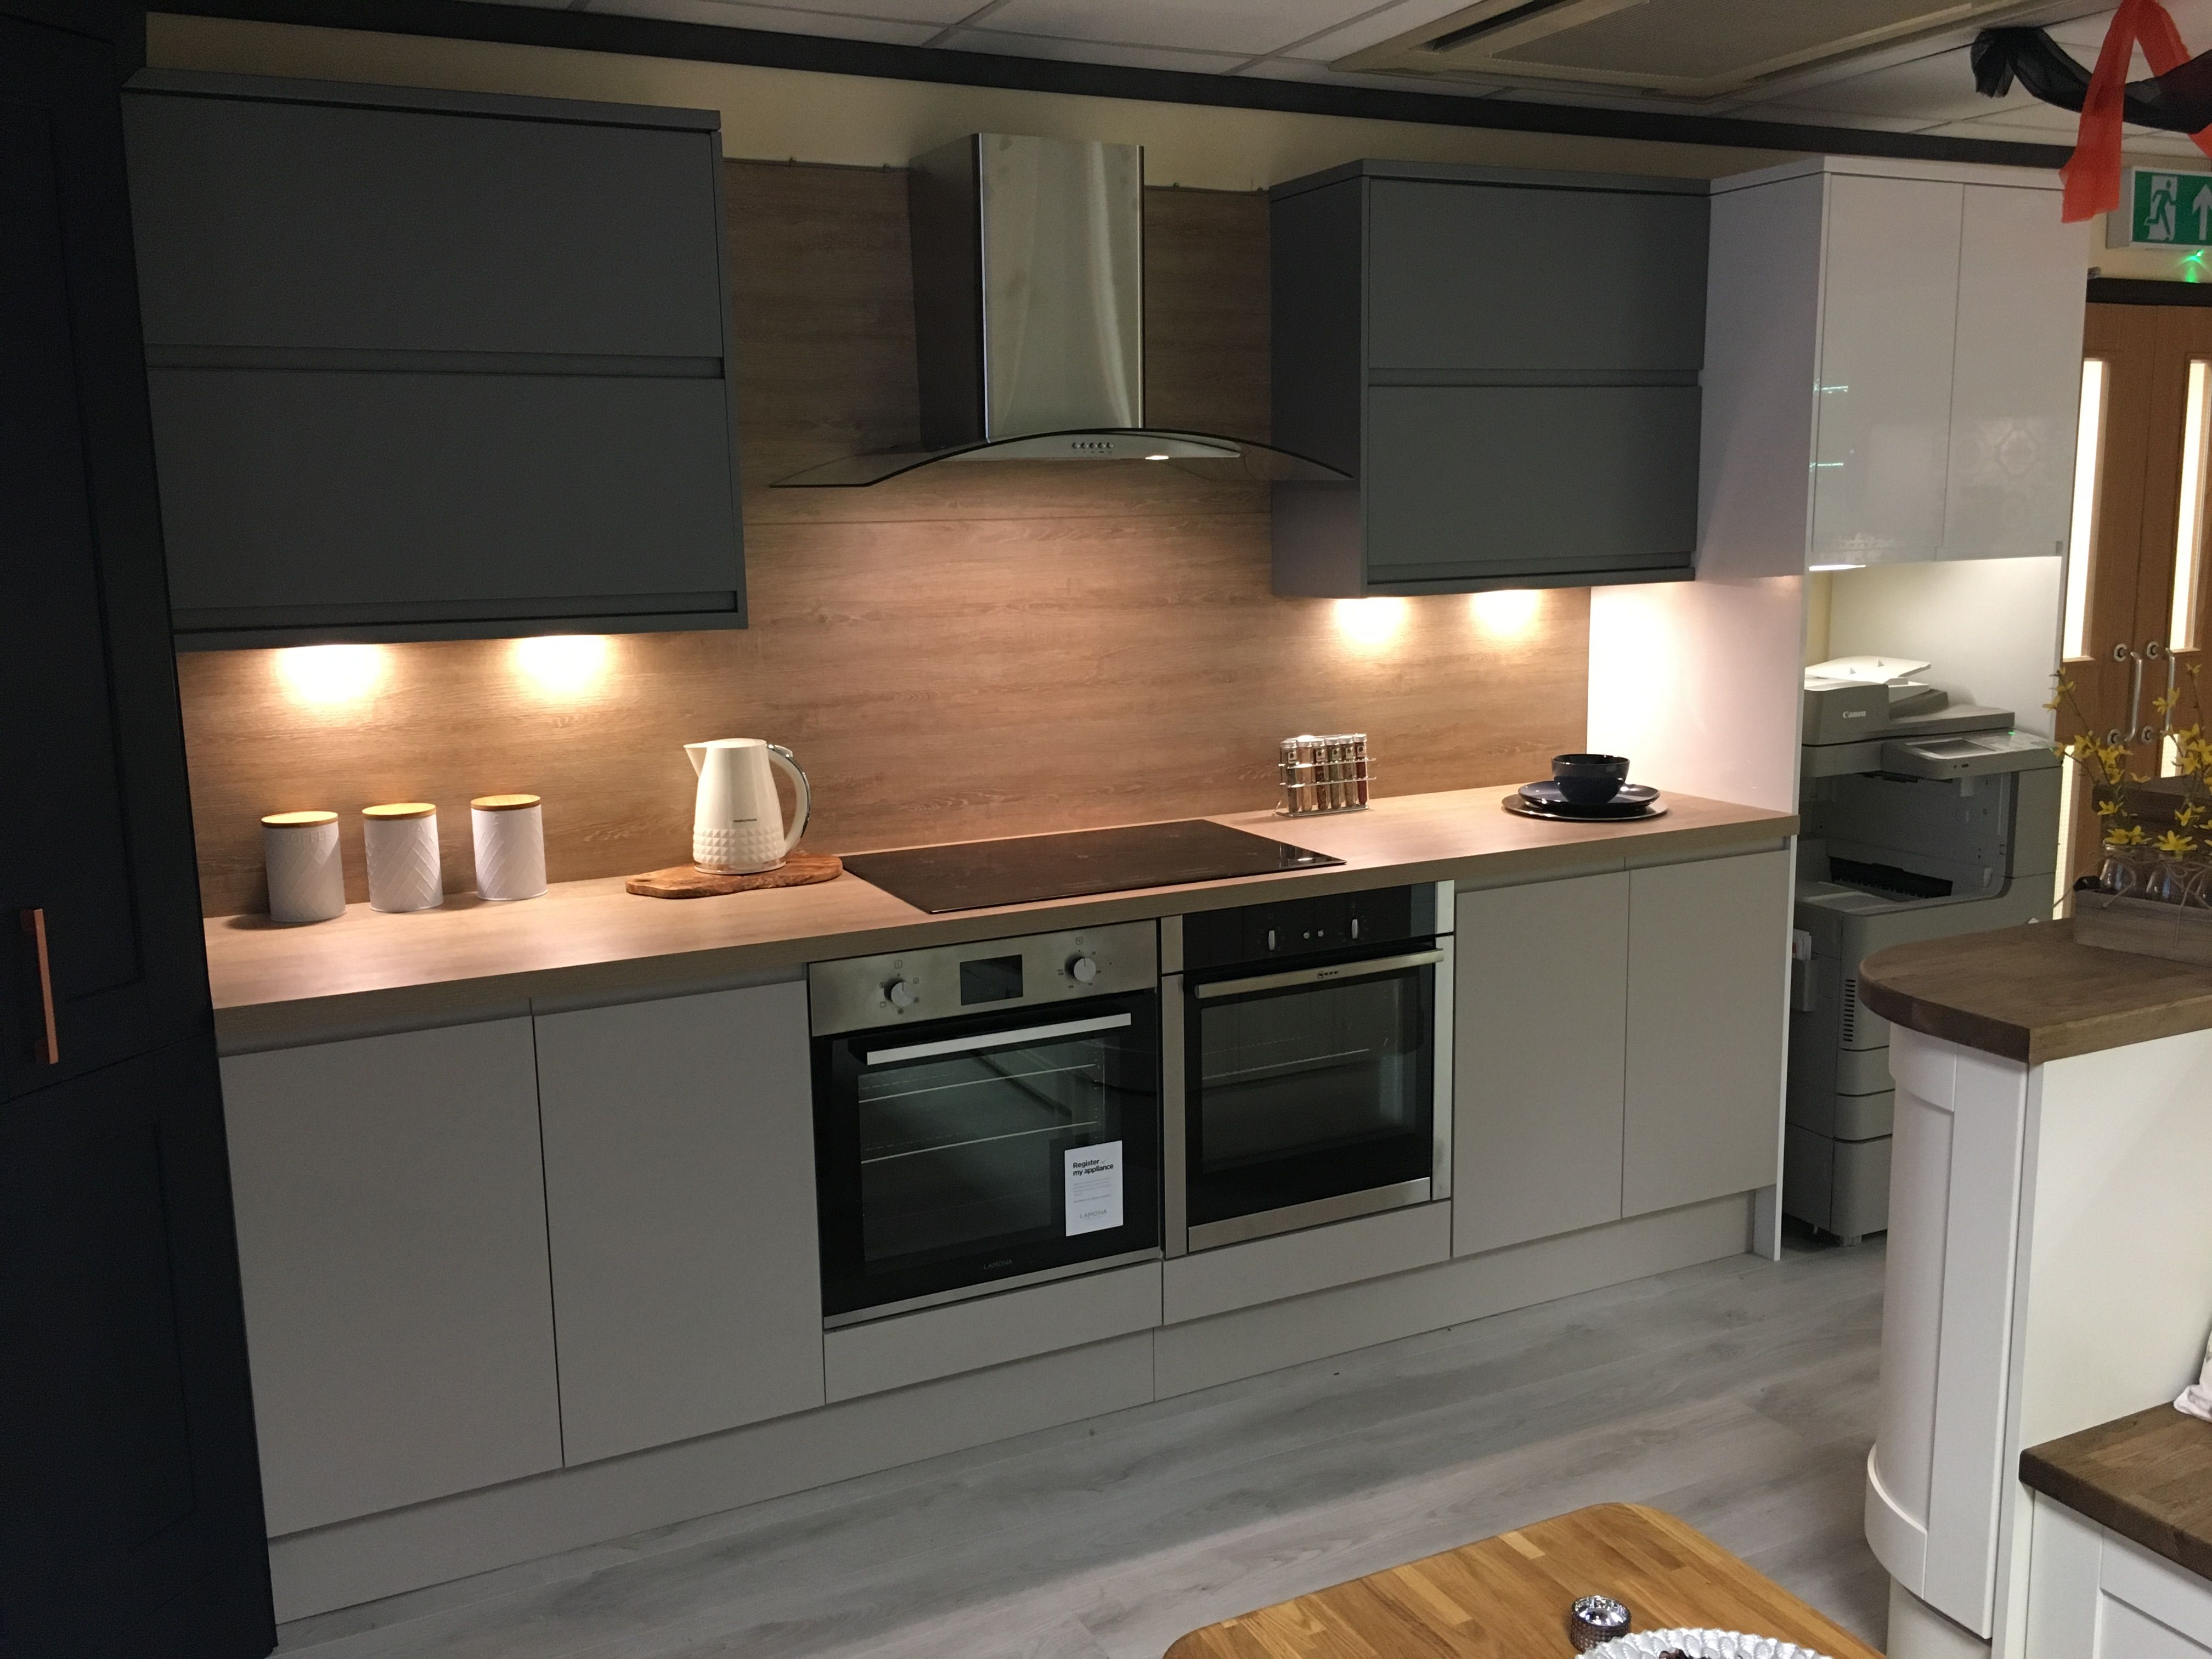 Cheap Kitchen Backsplash Ideas Colorful Cabinets Clerkenwell Matt Cashmere & Slate Grey | Kitchens In 2019 ...